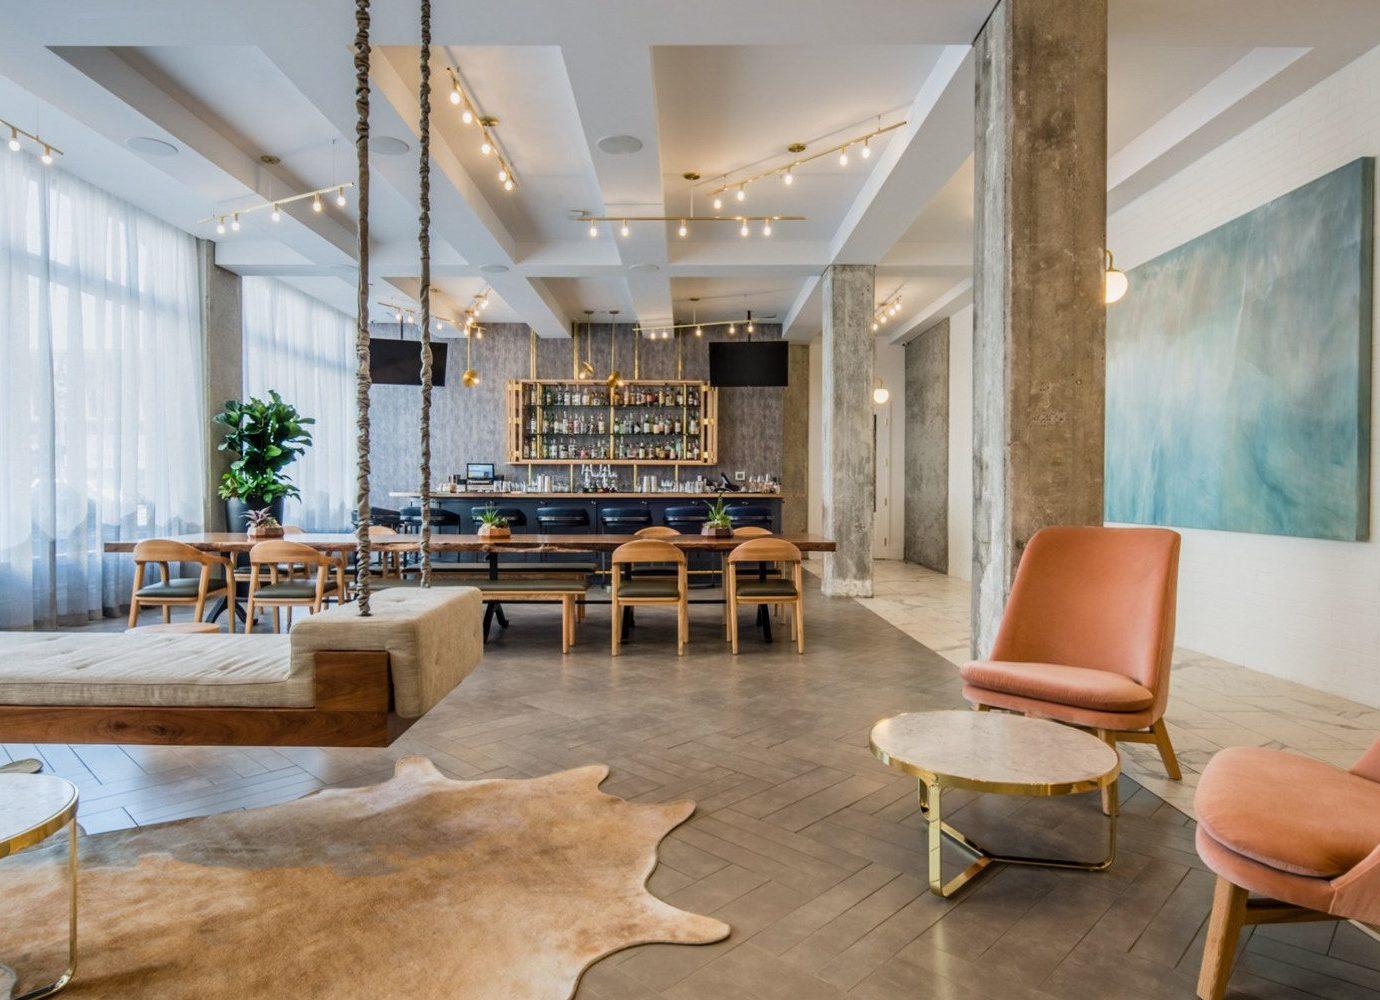 Boutique Hotels Hotels Luxury Travel indoor floor room Living interior design Lobby living room ceiling furniture loft table interior designer flooring area